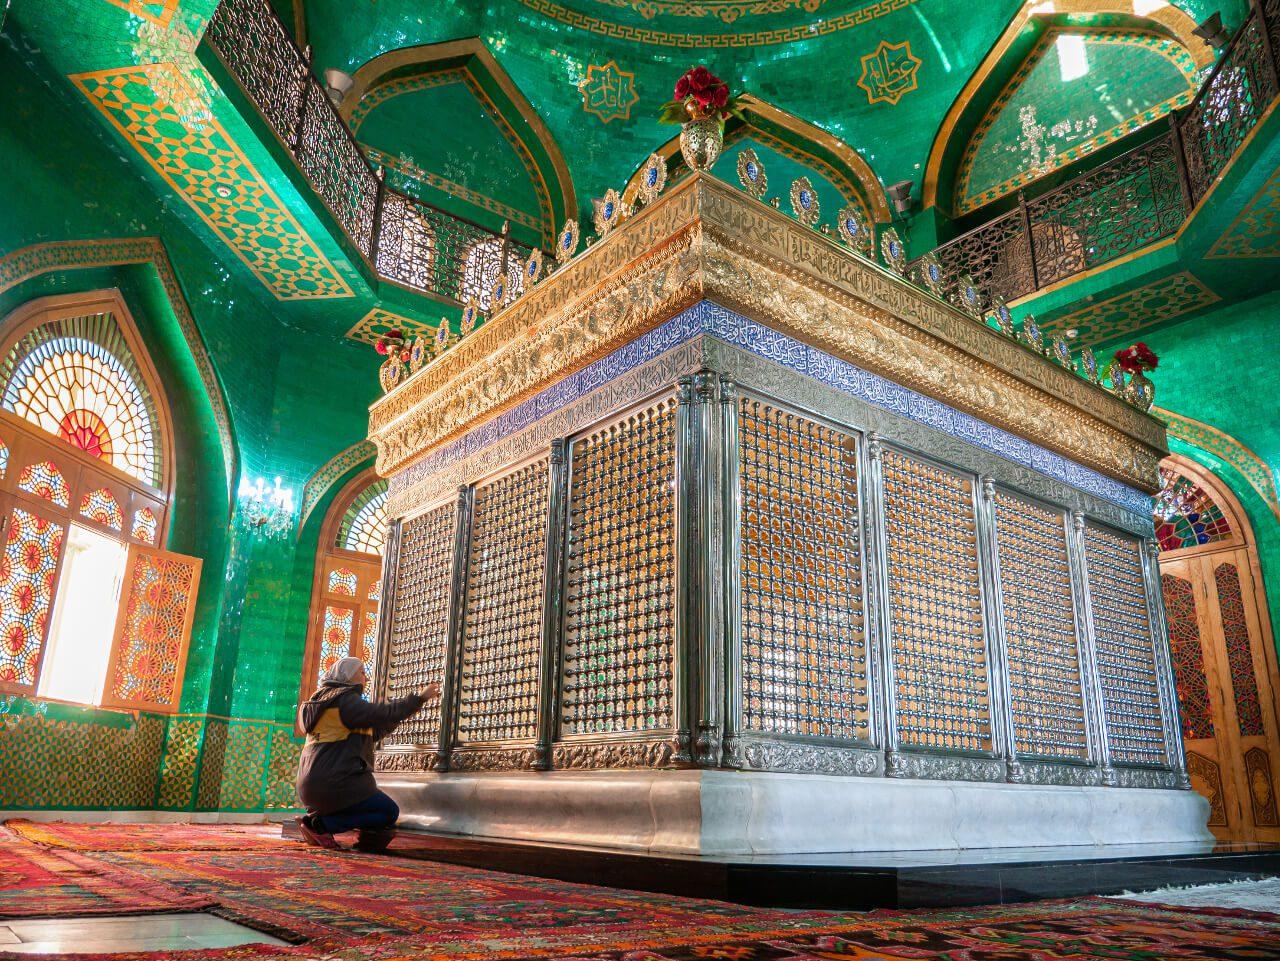 Wnętrze Meczet Bibi Heybat Baku